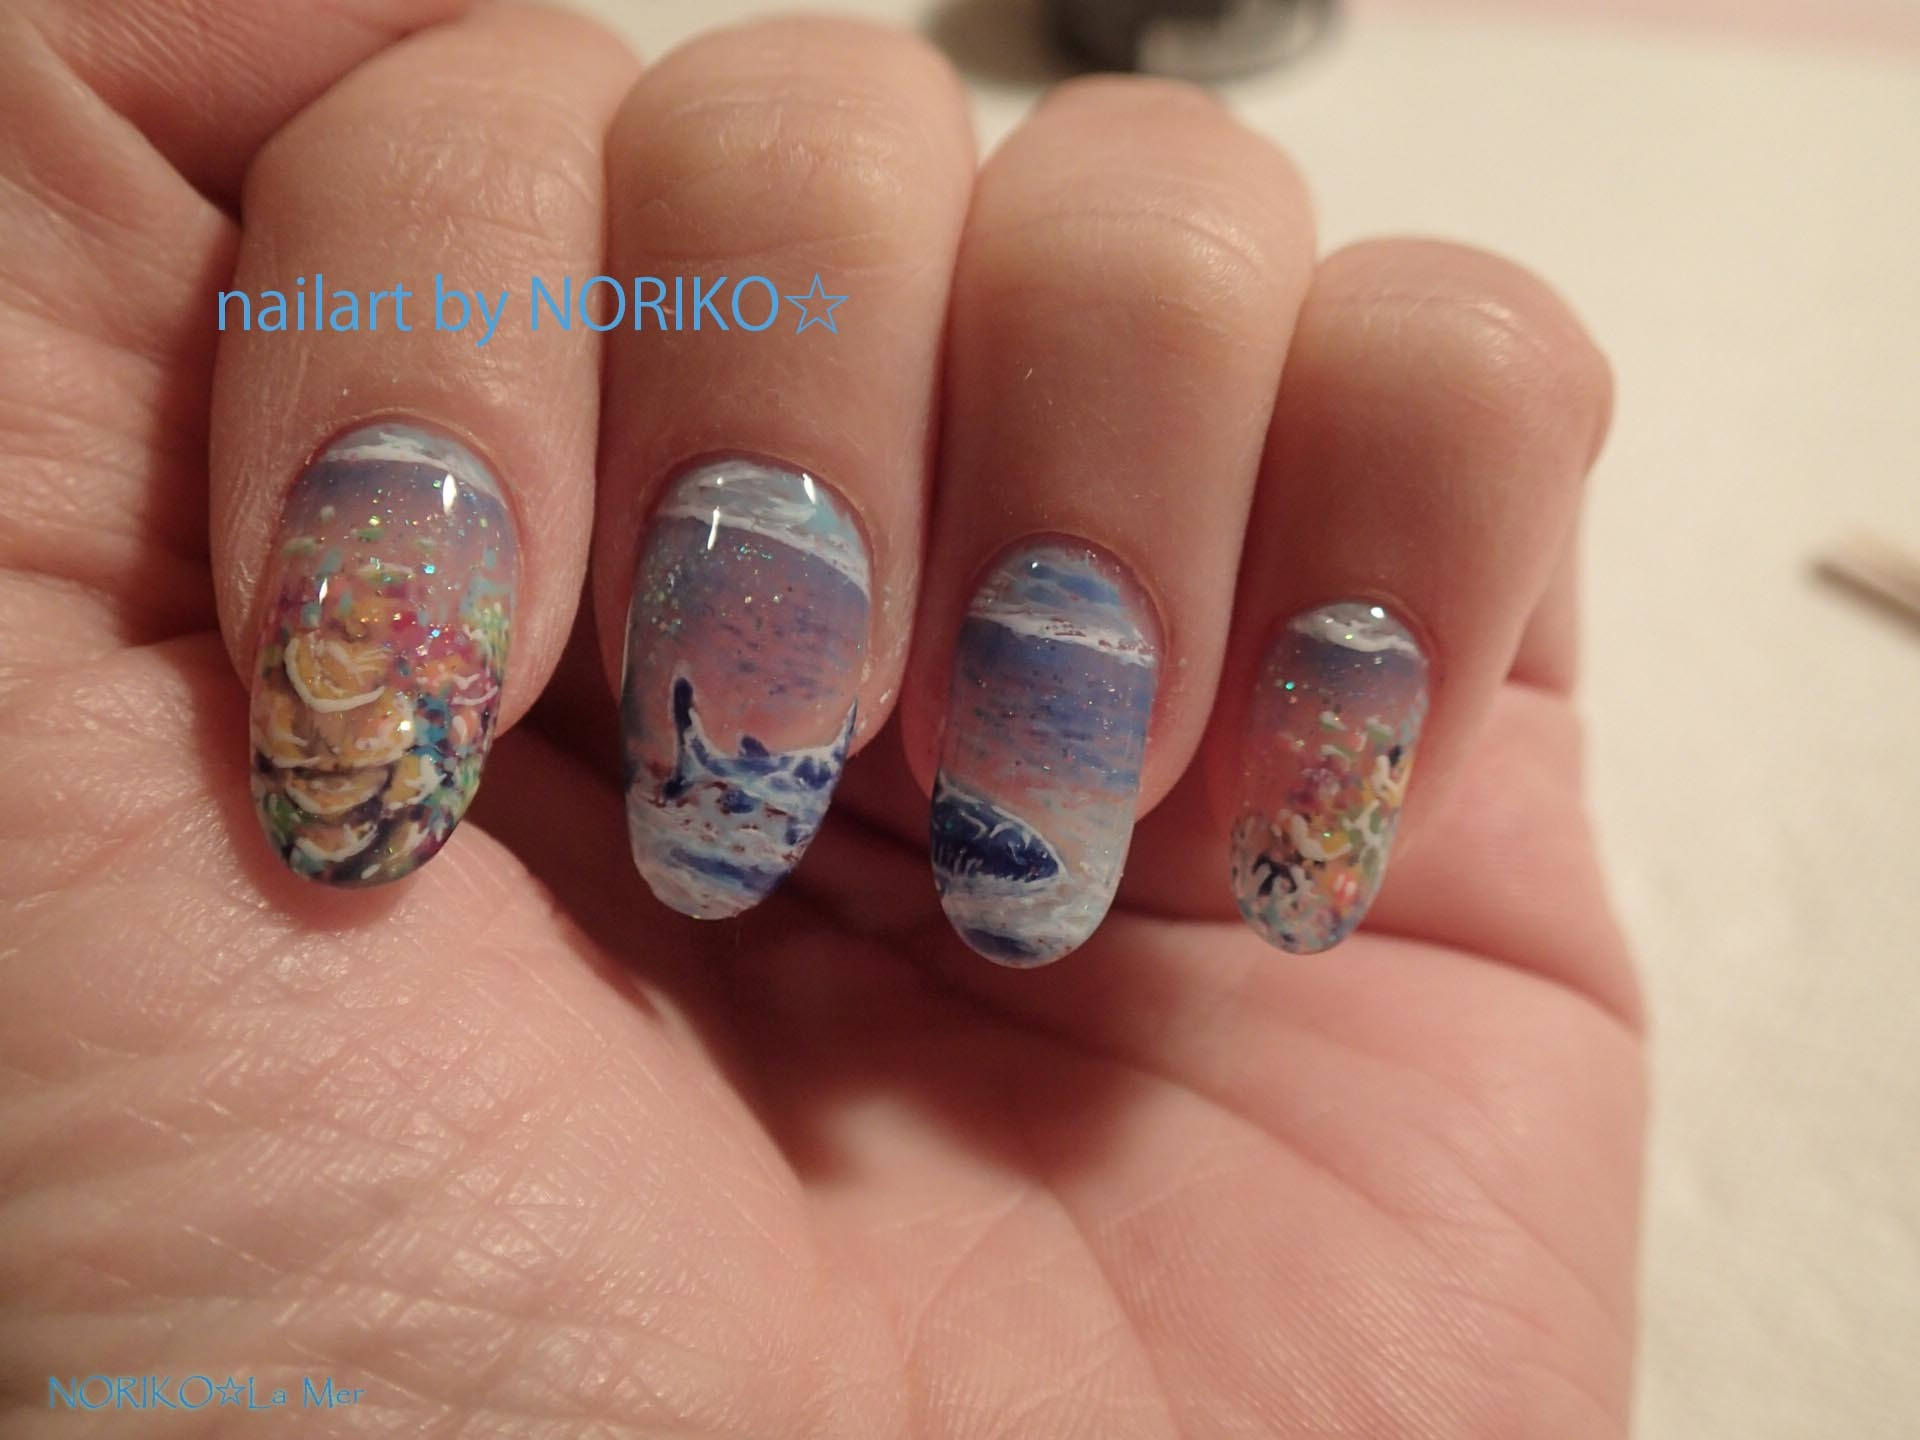 Nail Artist NORIKO palau gelpaint _9